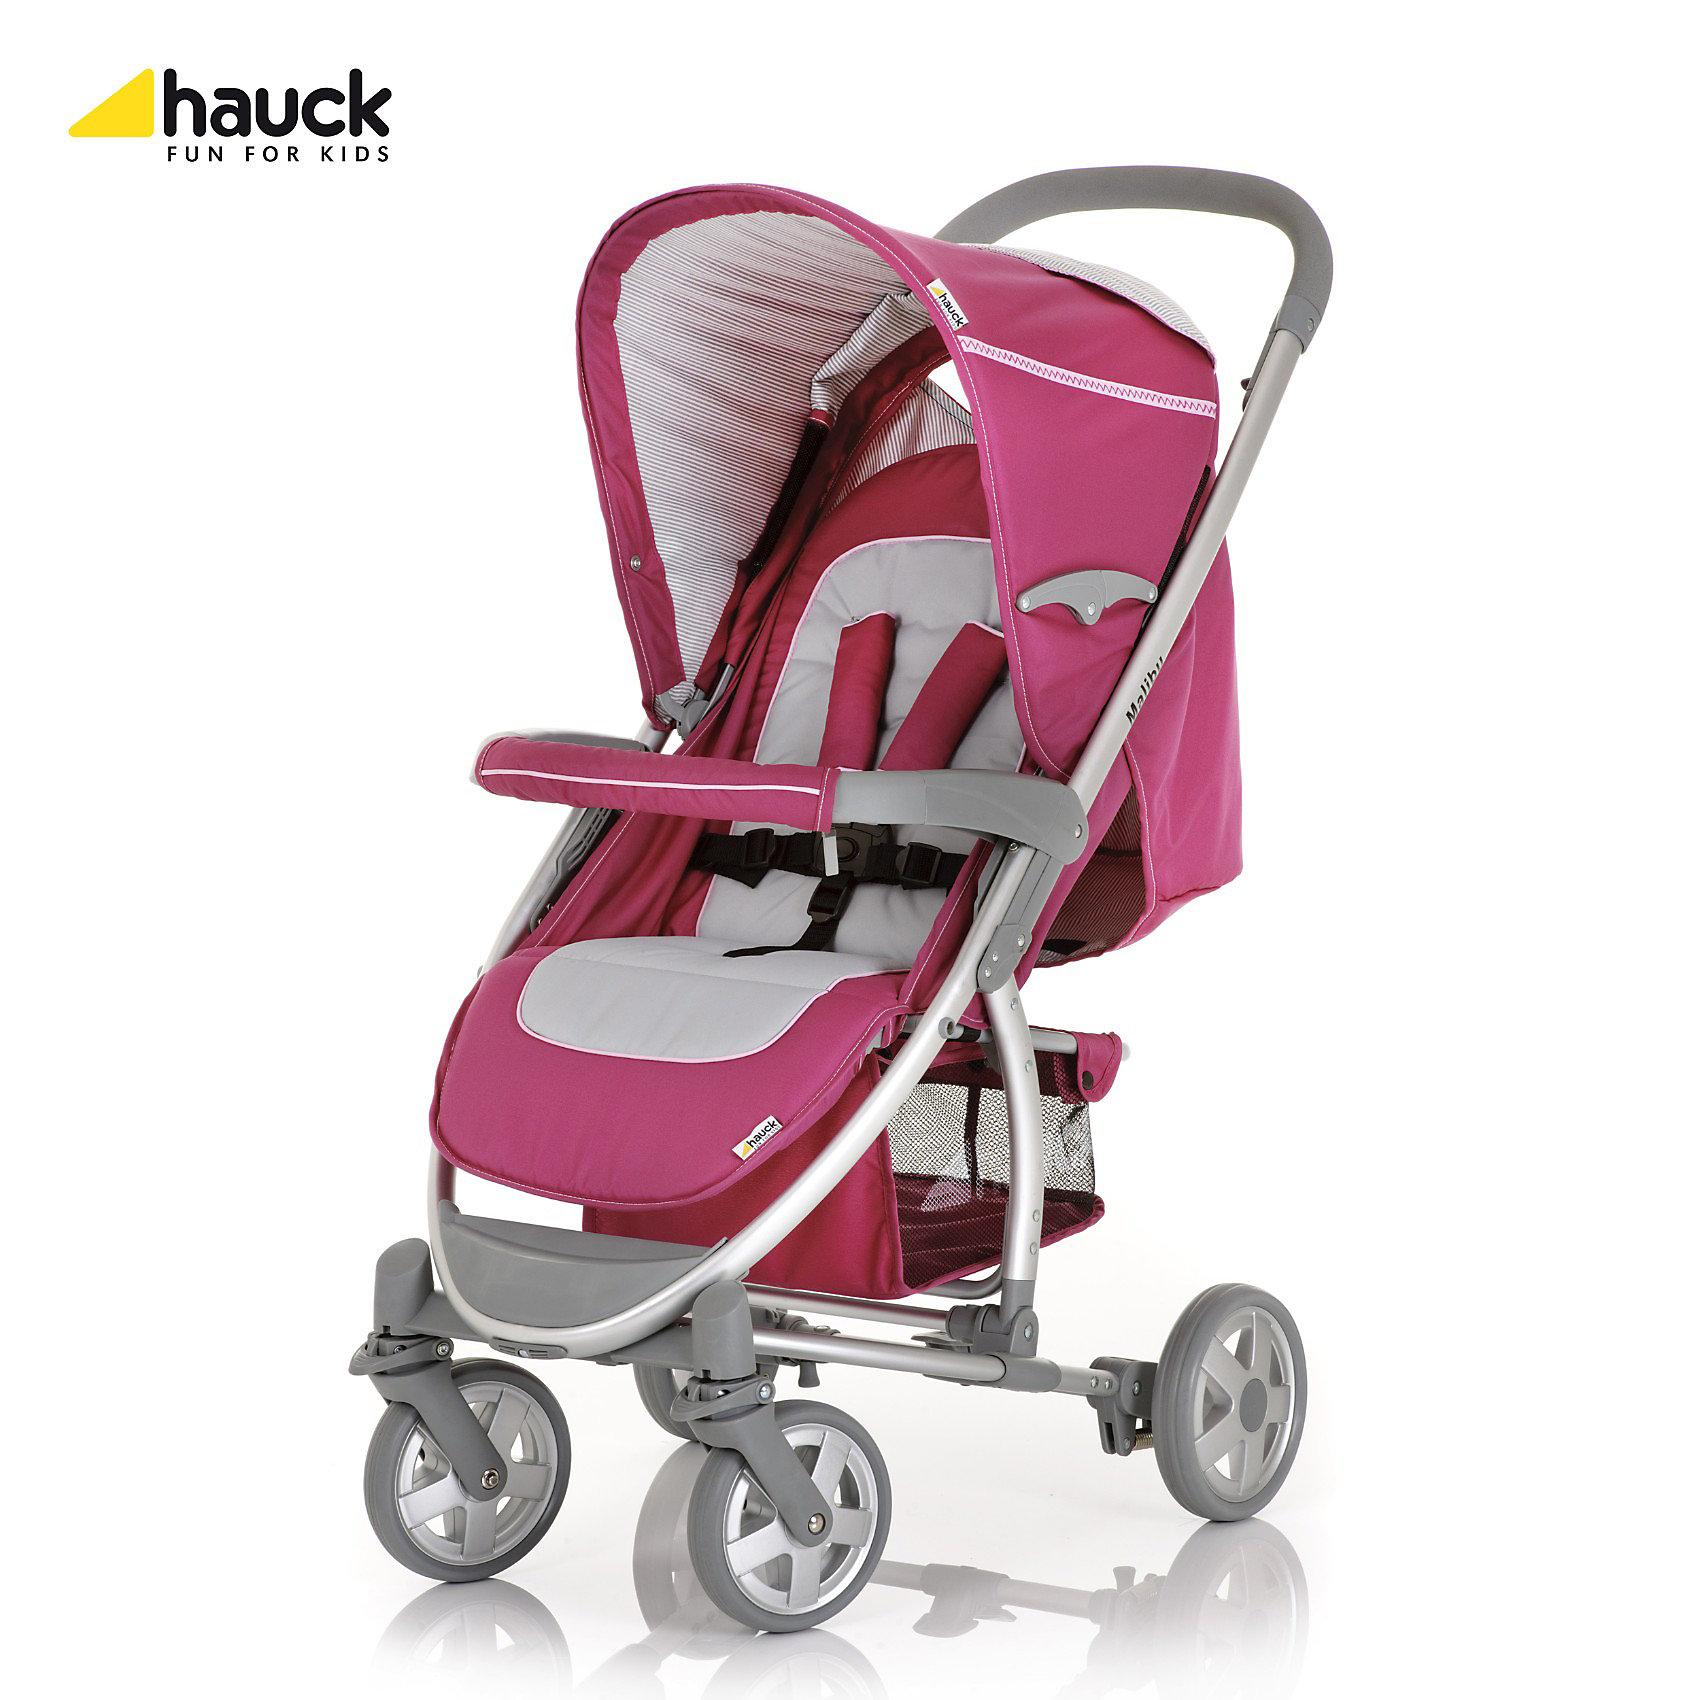 hauck Прогулочная коляска Malibu М-12, Hauck, violett коляска hauck sprint pearl fungfi